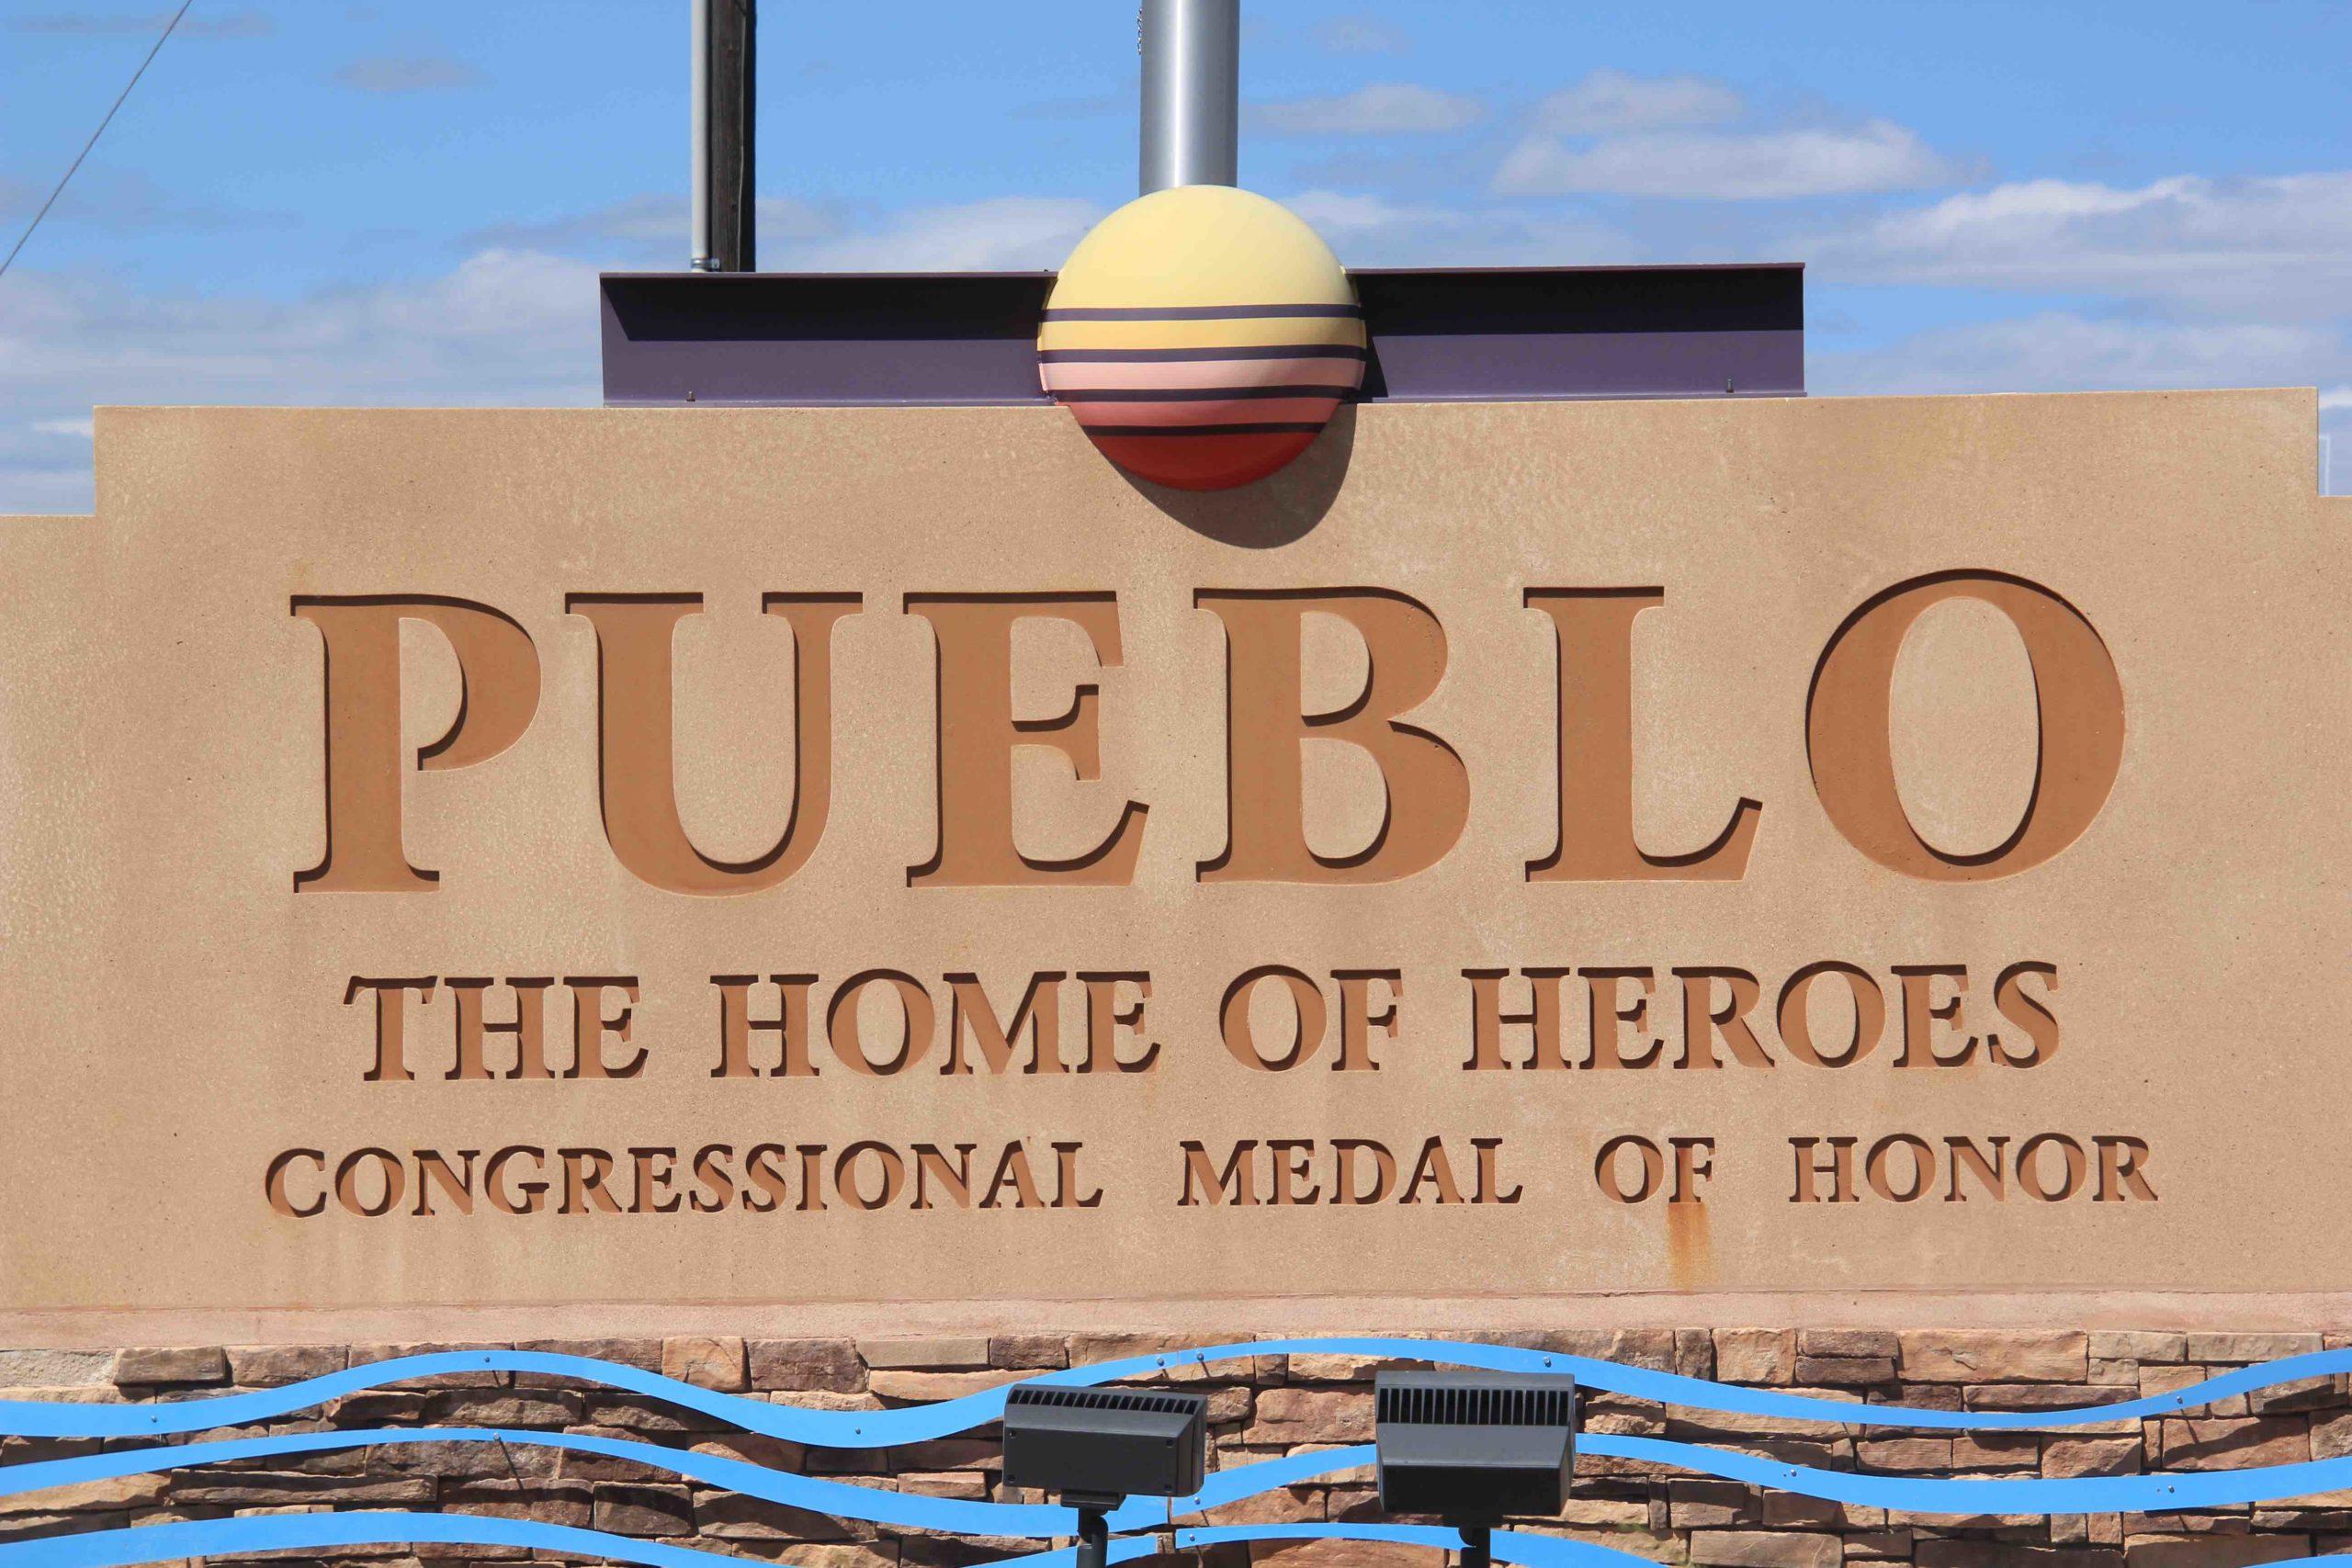 David takes on Goliath in Pueblo